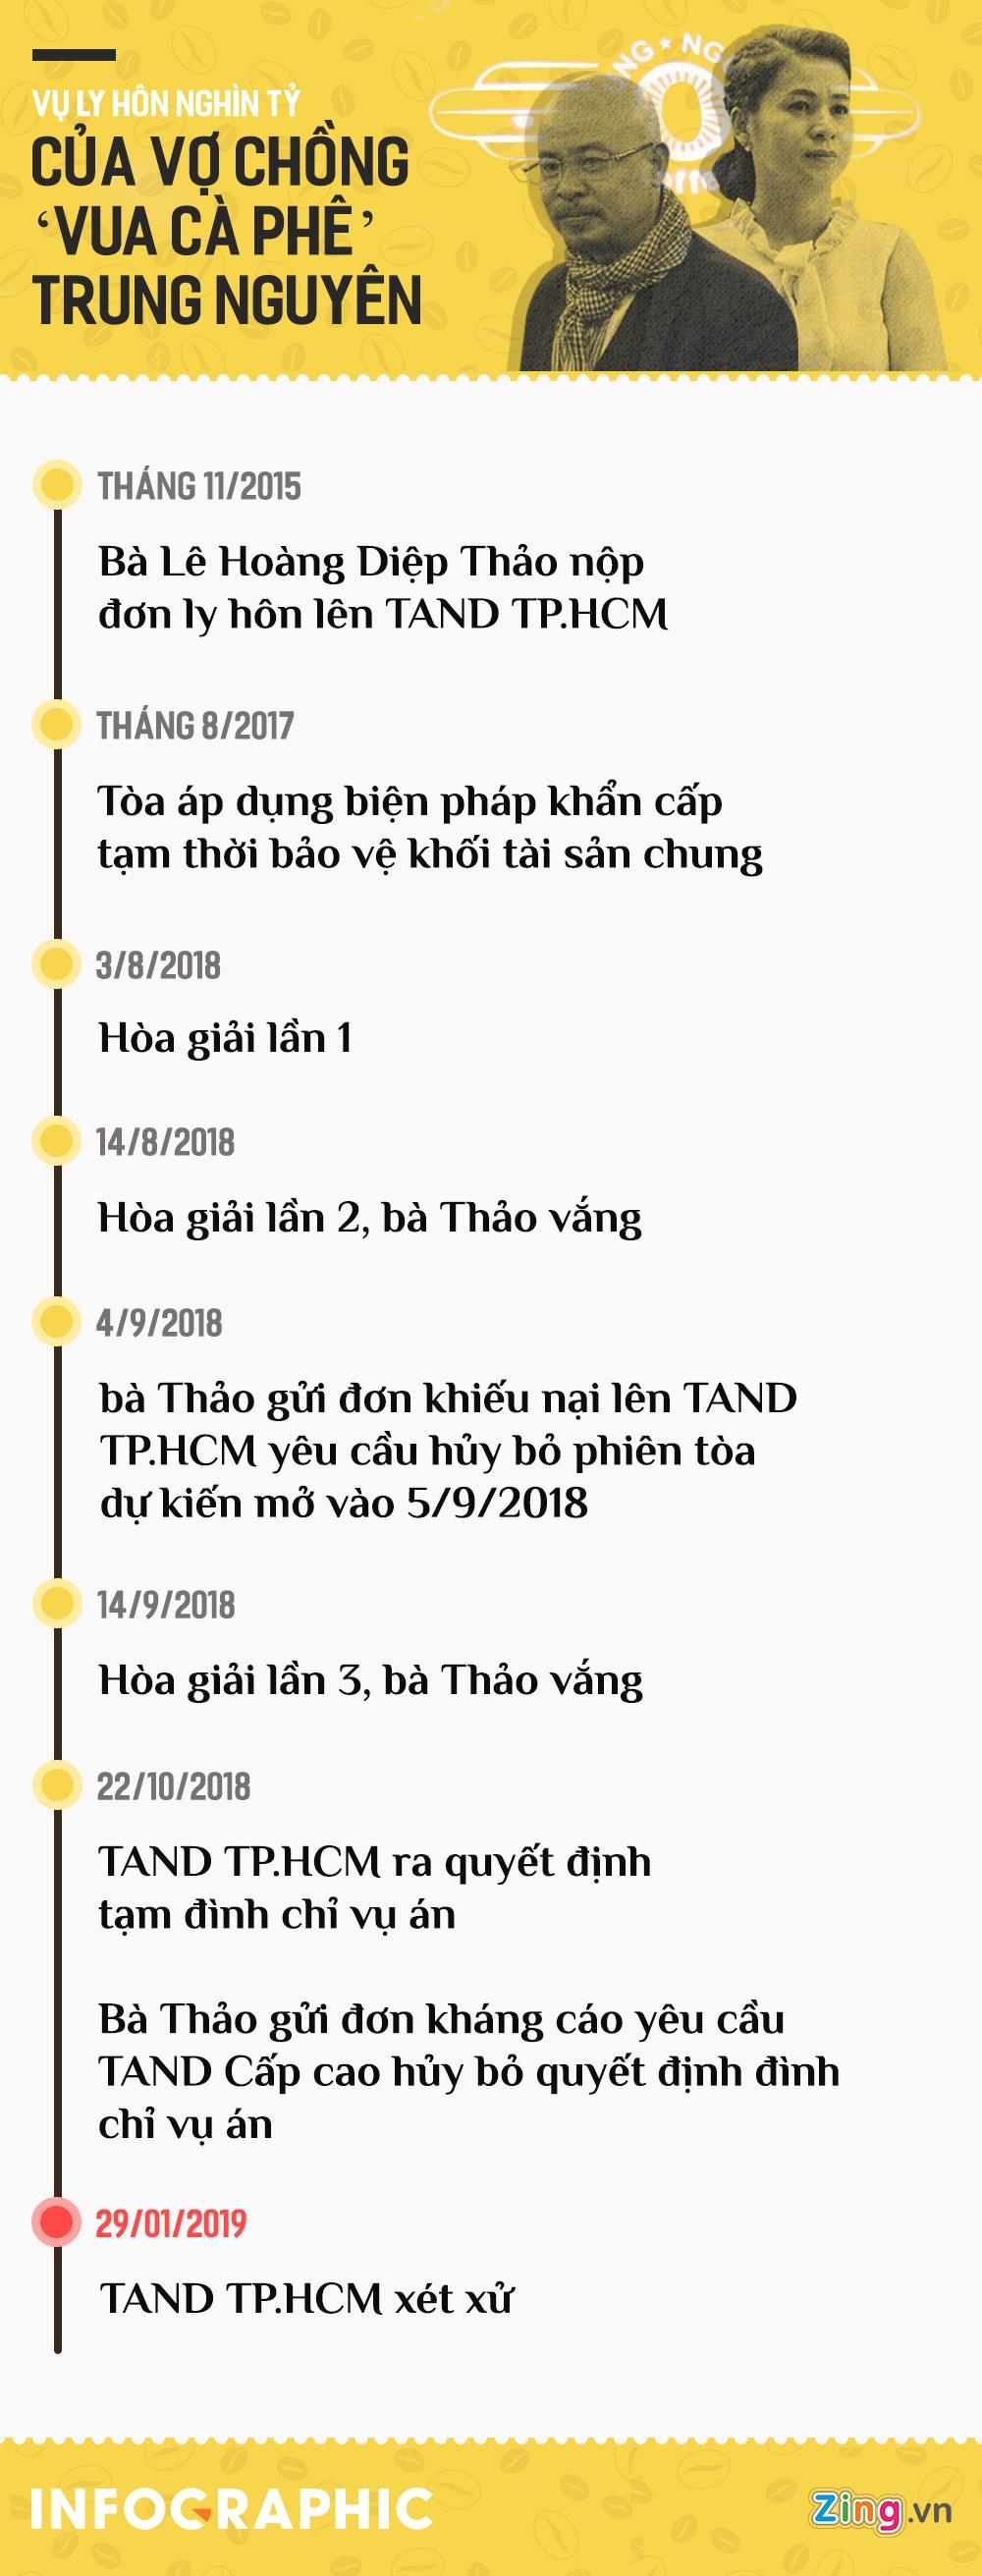 vu ly hon Trung Nguyen anh 4